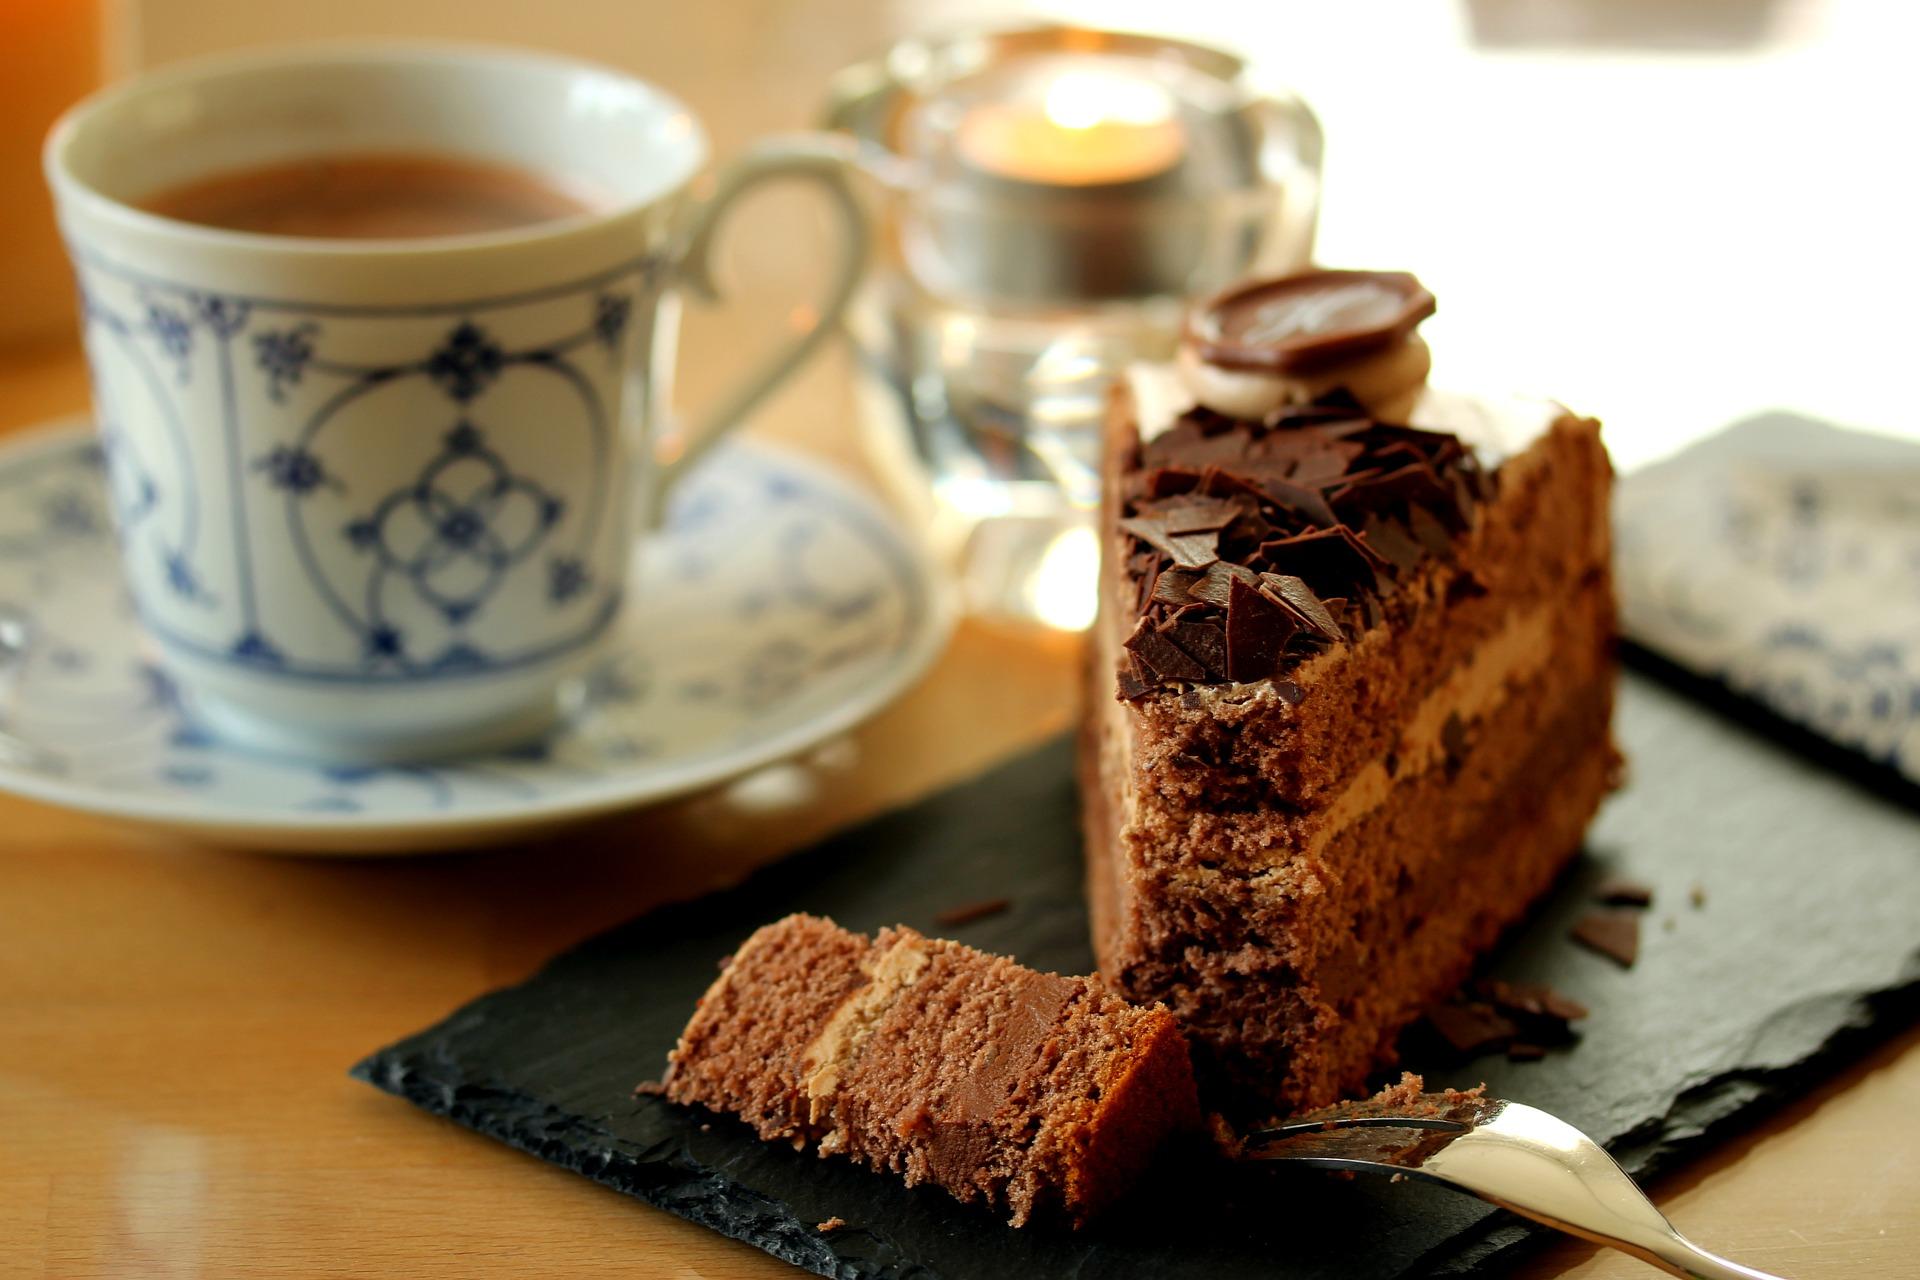 schokolade2 - Süßes